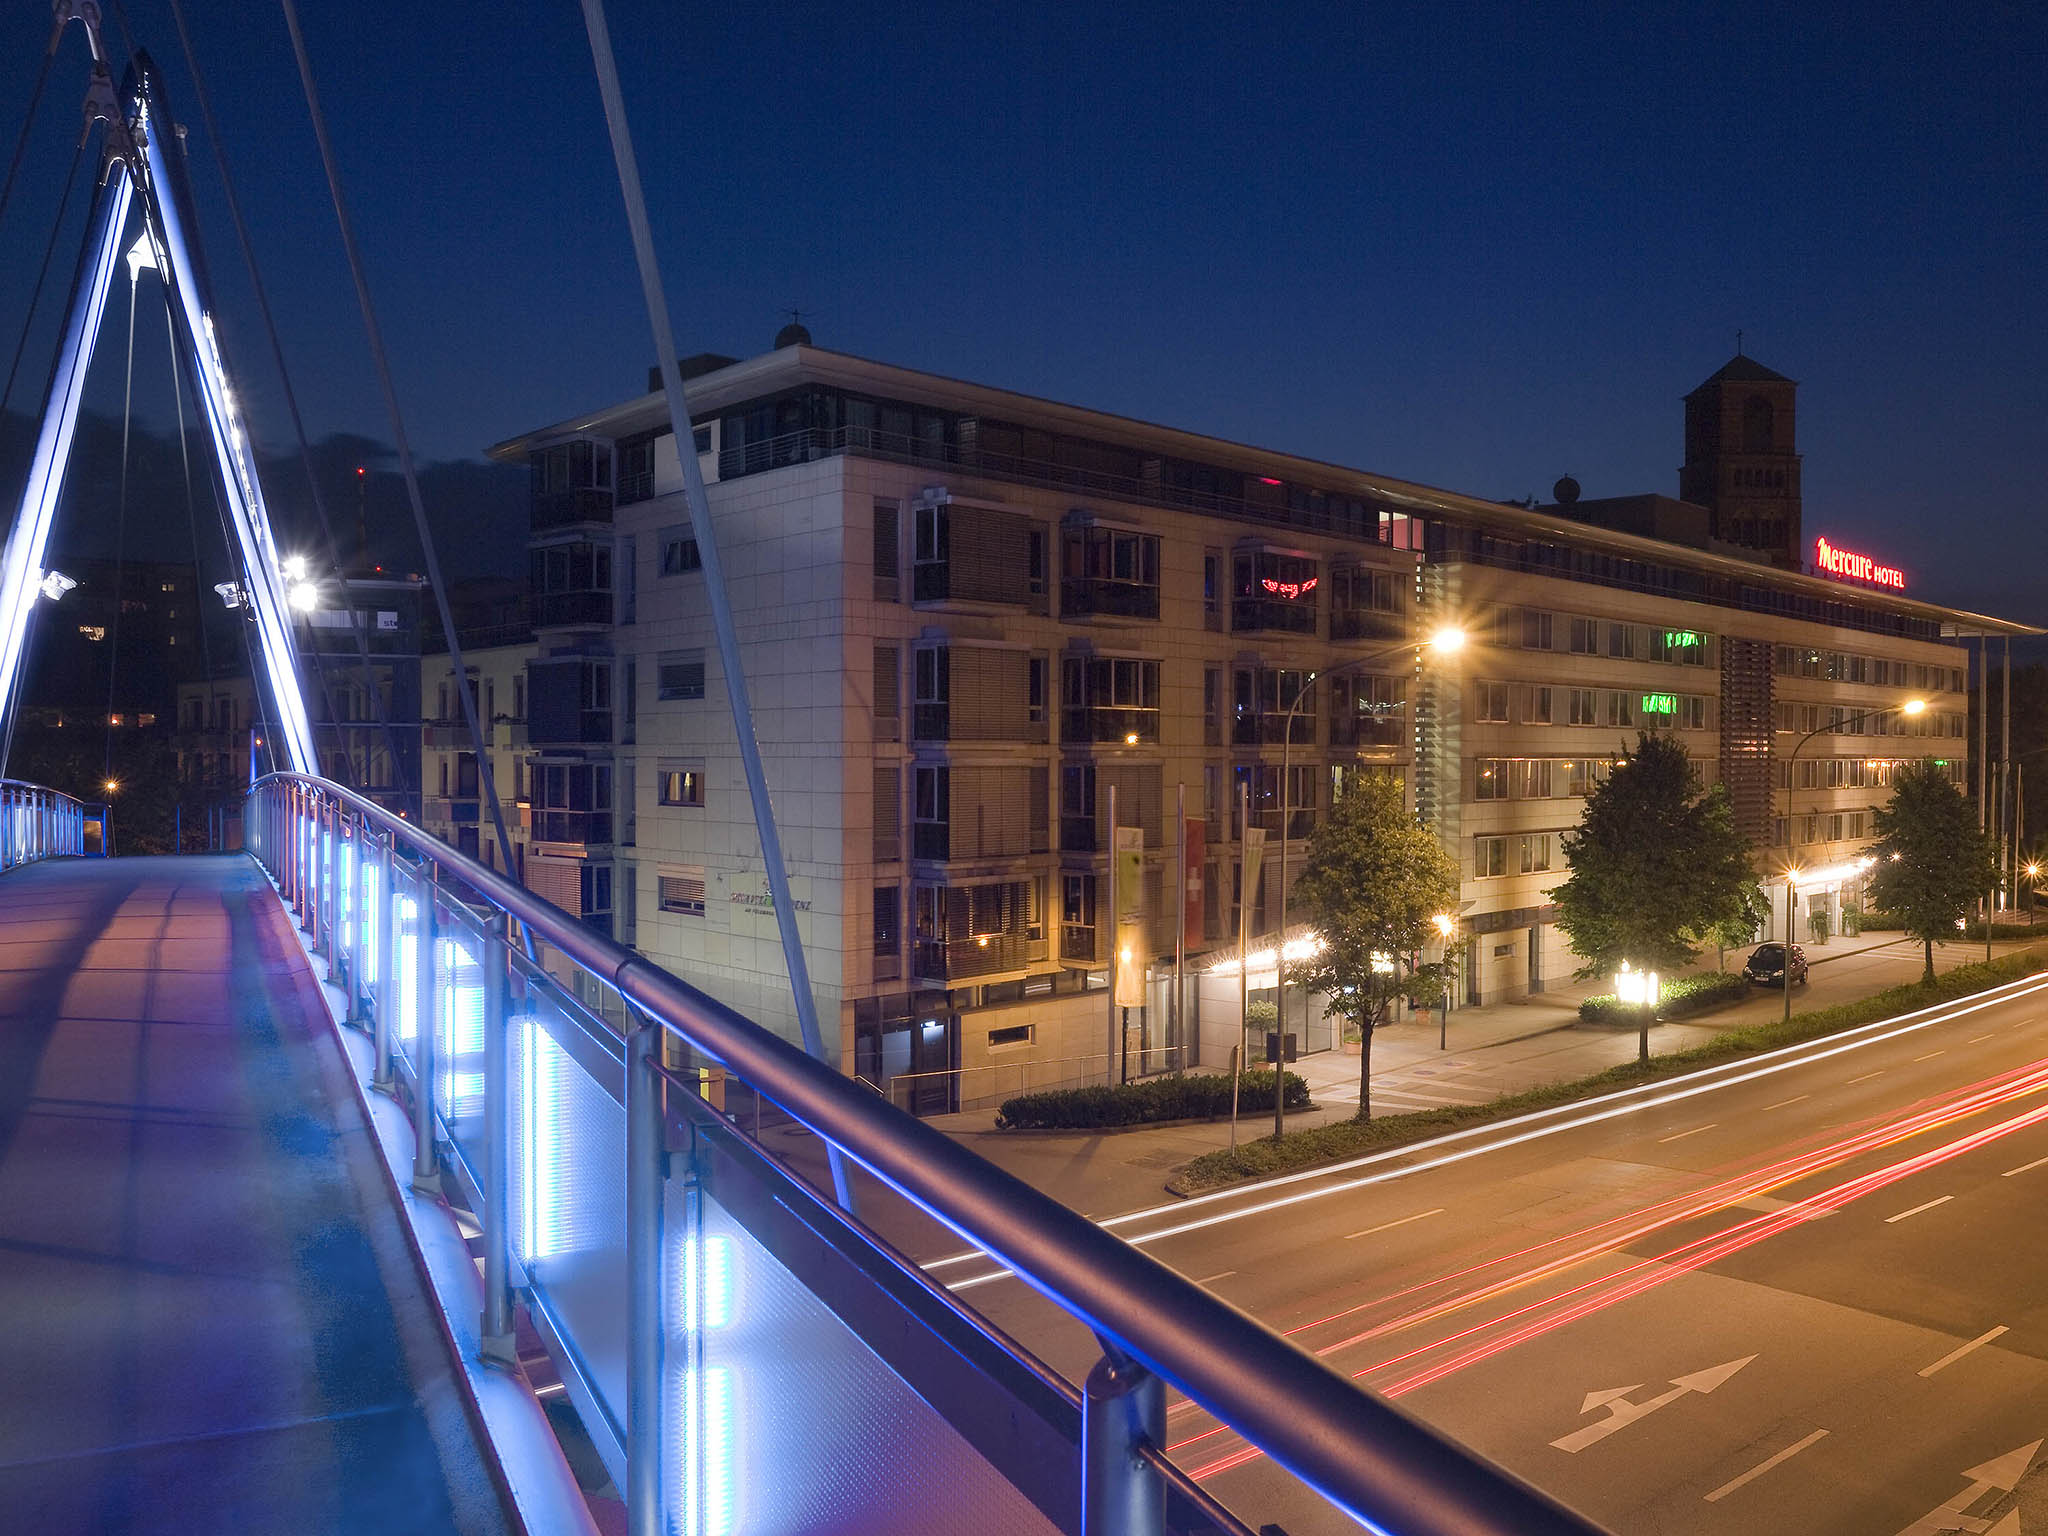 Hotell – Mercure Hotel Plaza Essen